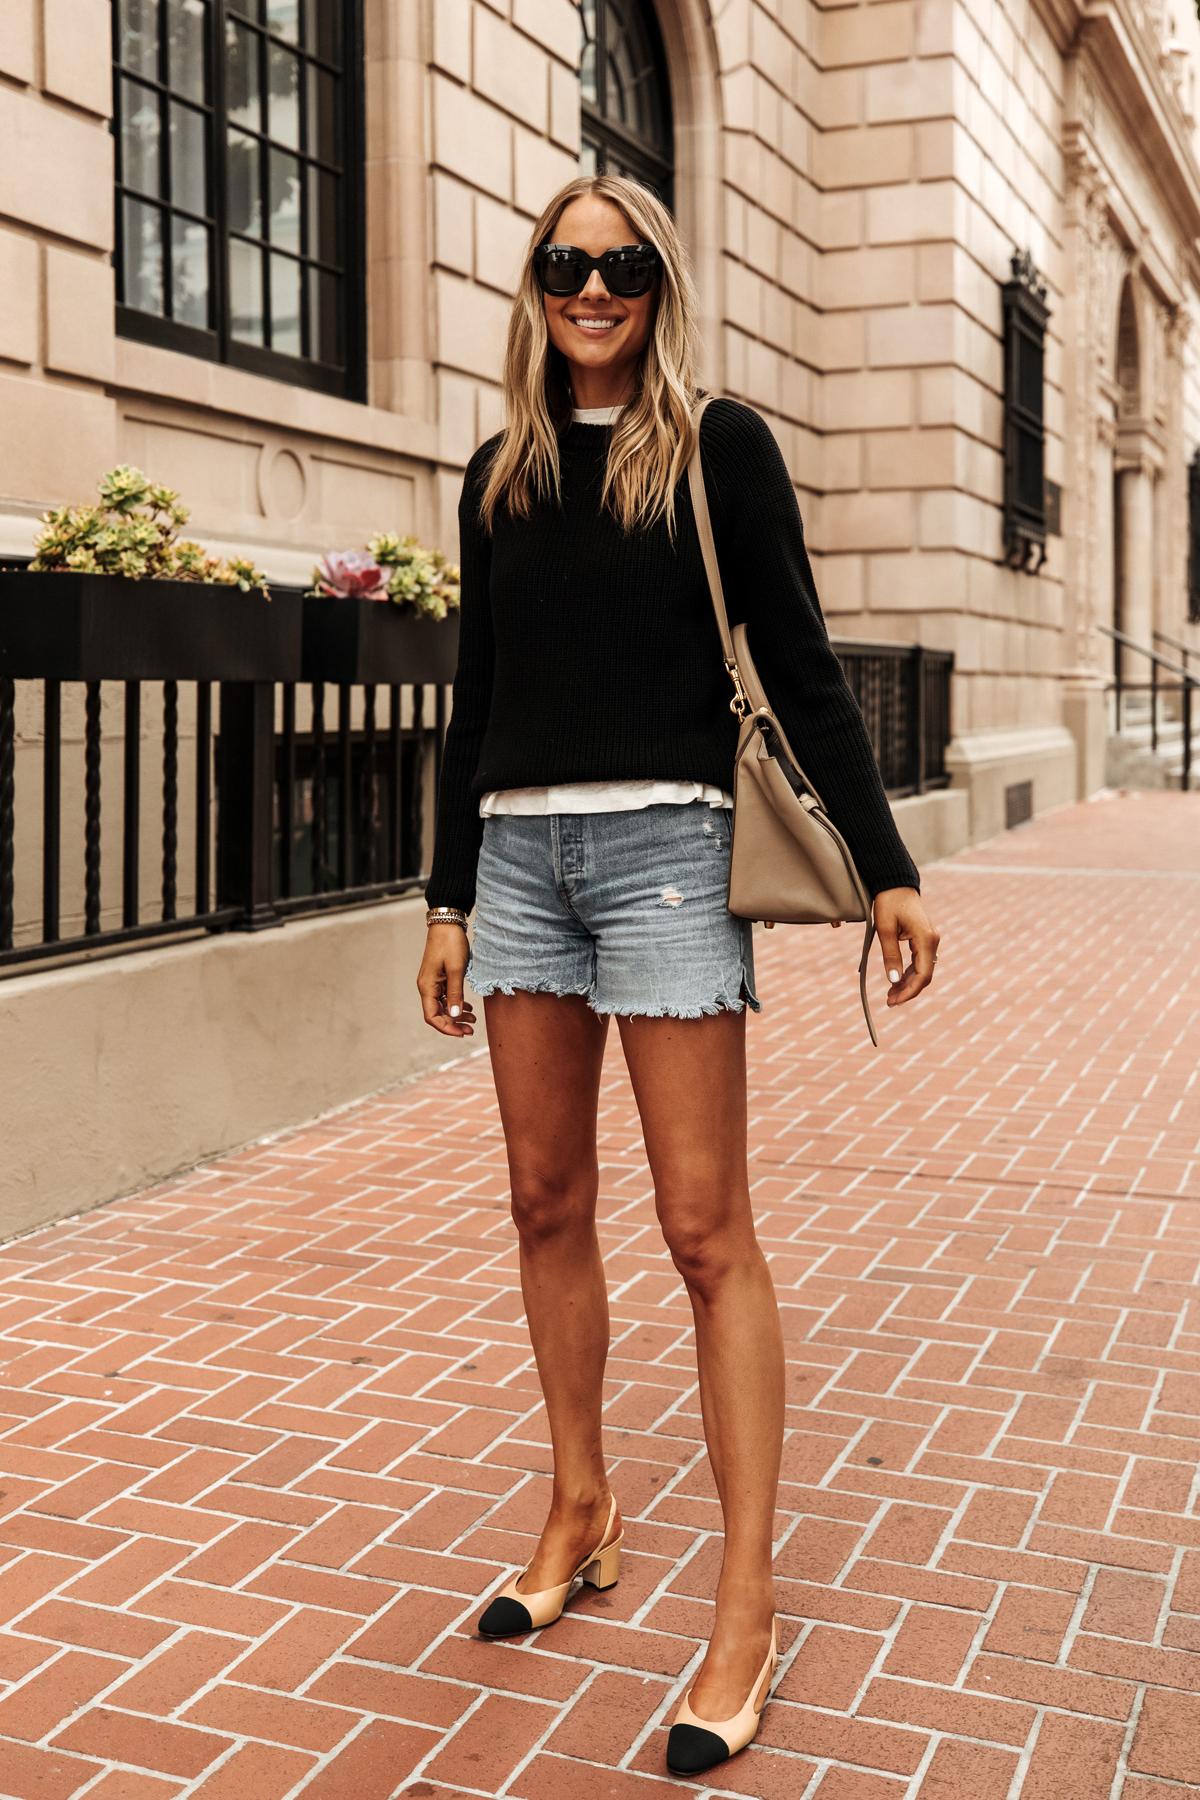 Fashion Jackson Wearing Jenni Kayne Black Fisherman Sweater White Tshirt Denim Shorts Chanel Slingbacks Outfit